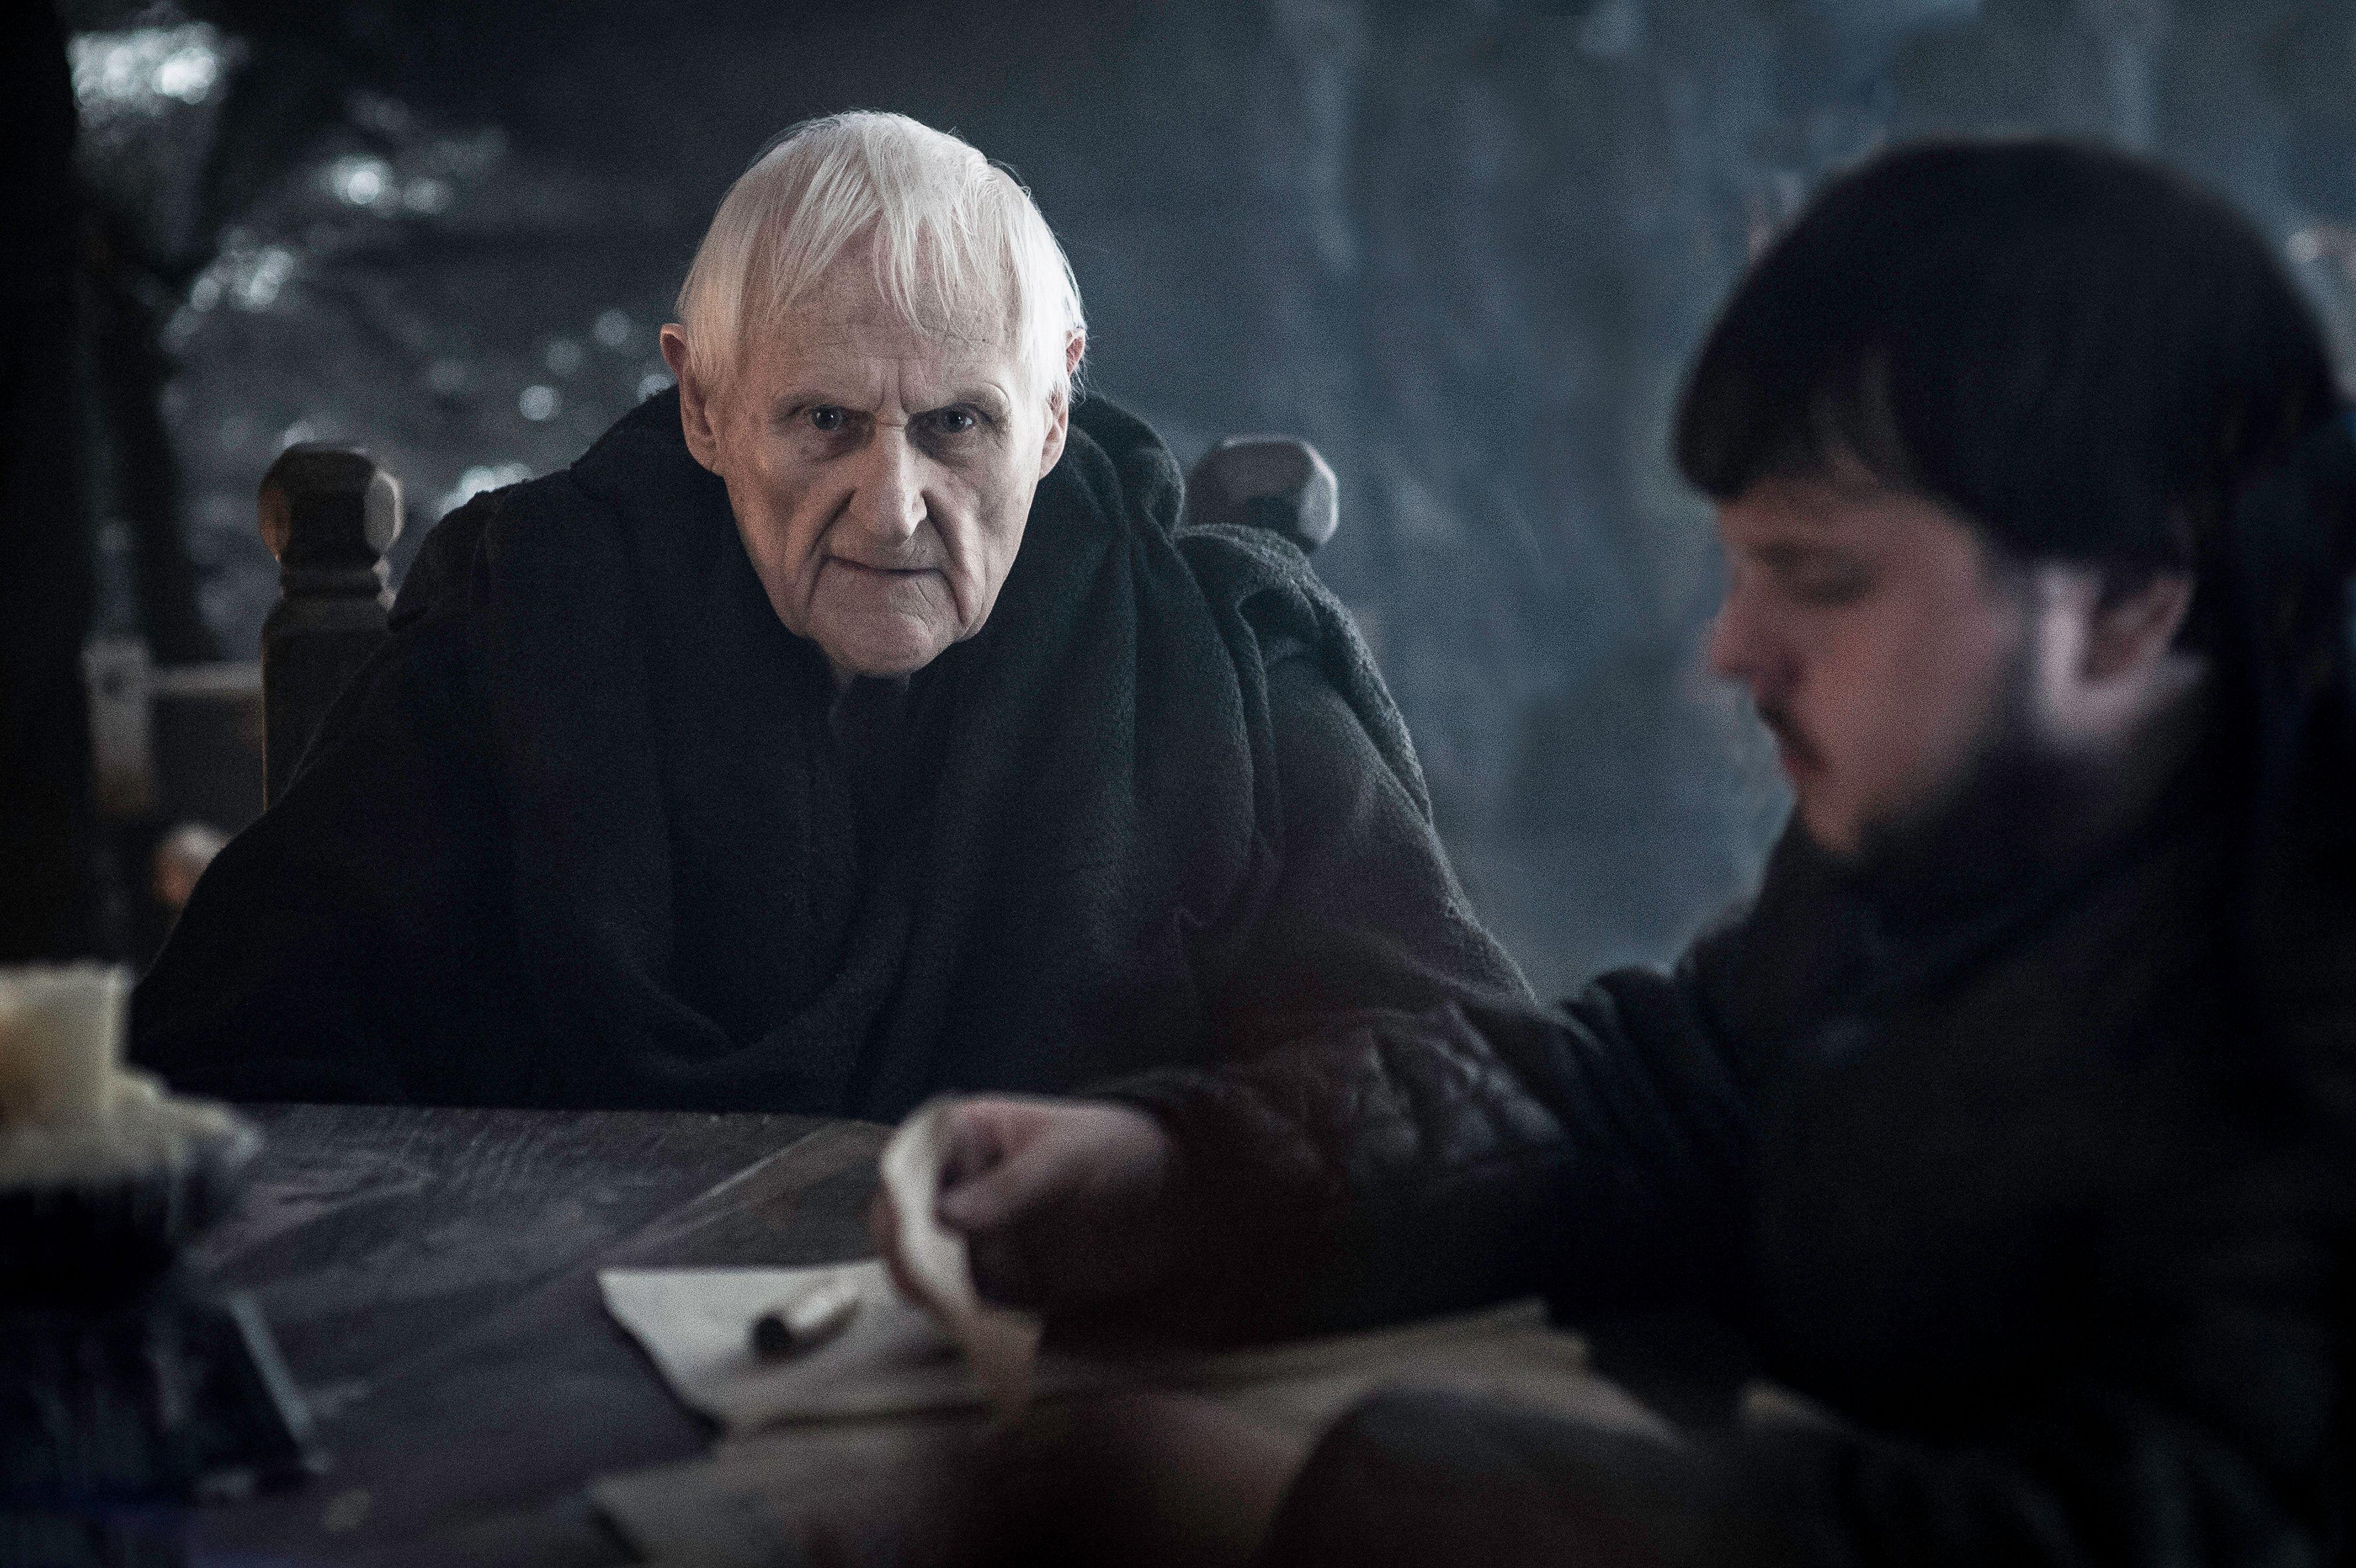 game of thrones season 5 complete recap official (hbo)